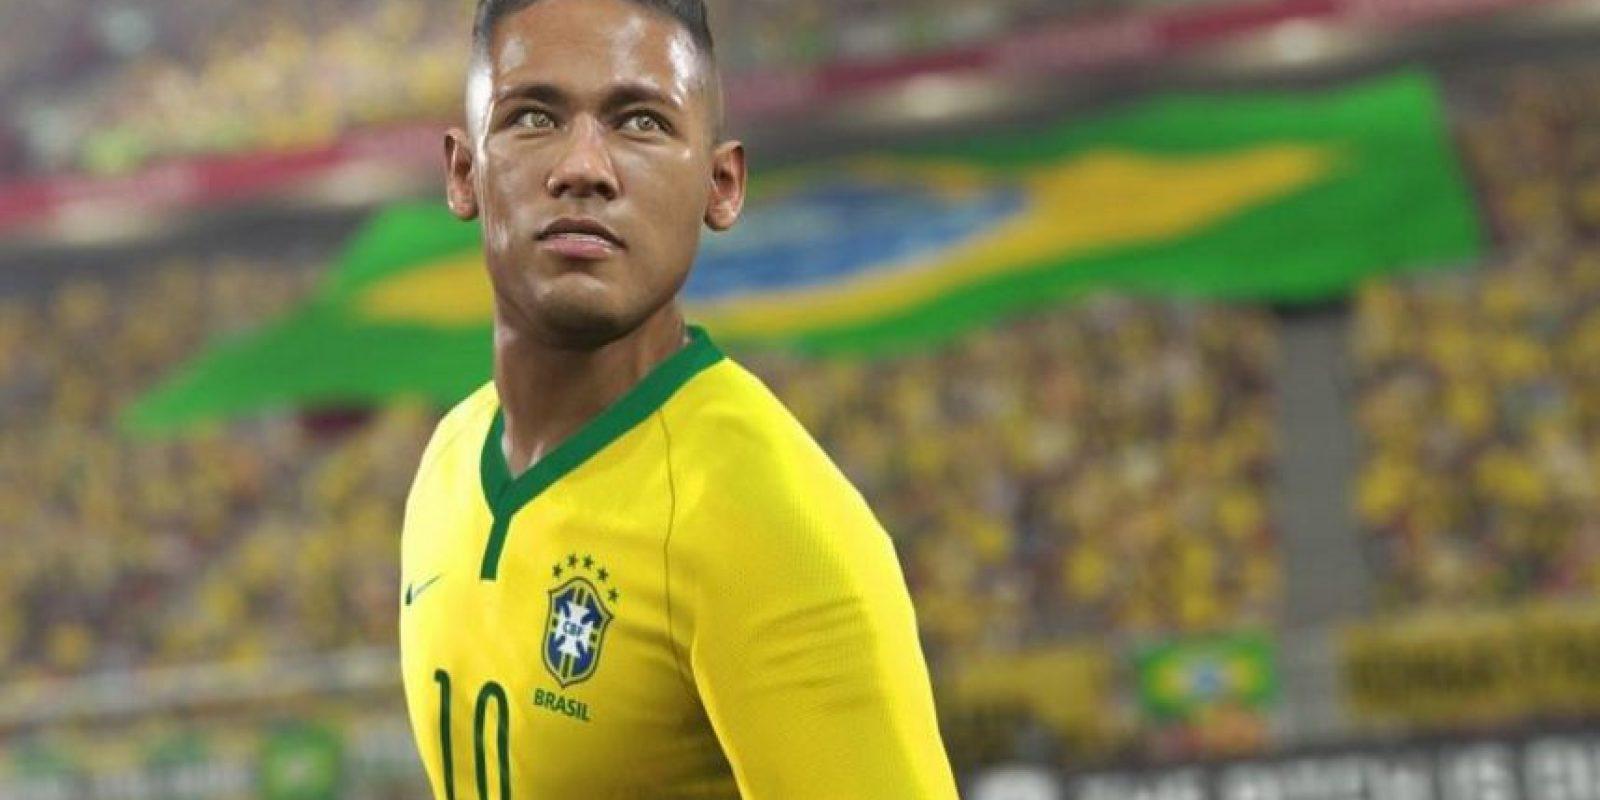 Neymar en el PES 2016. Foto:Twitter